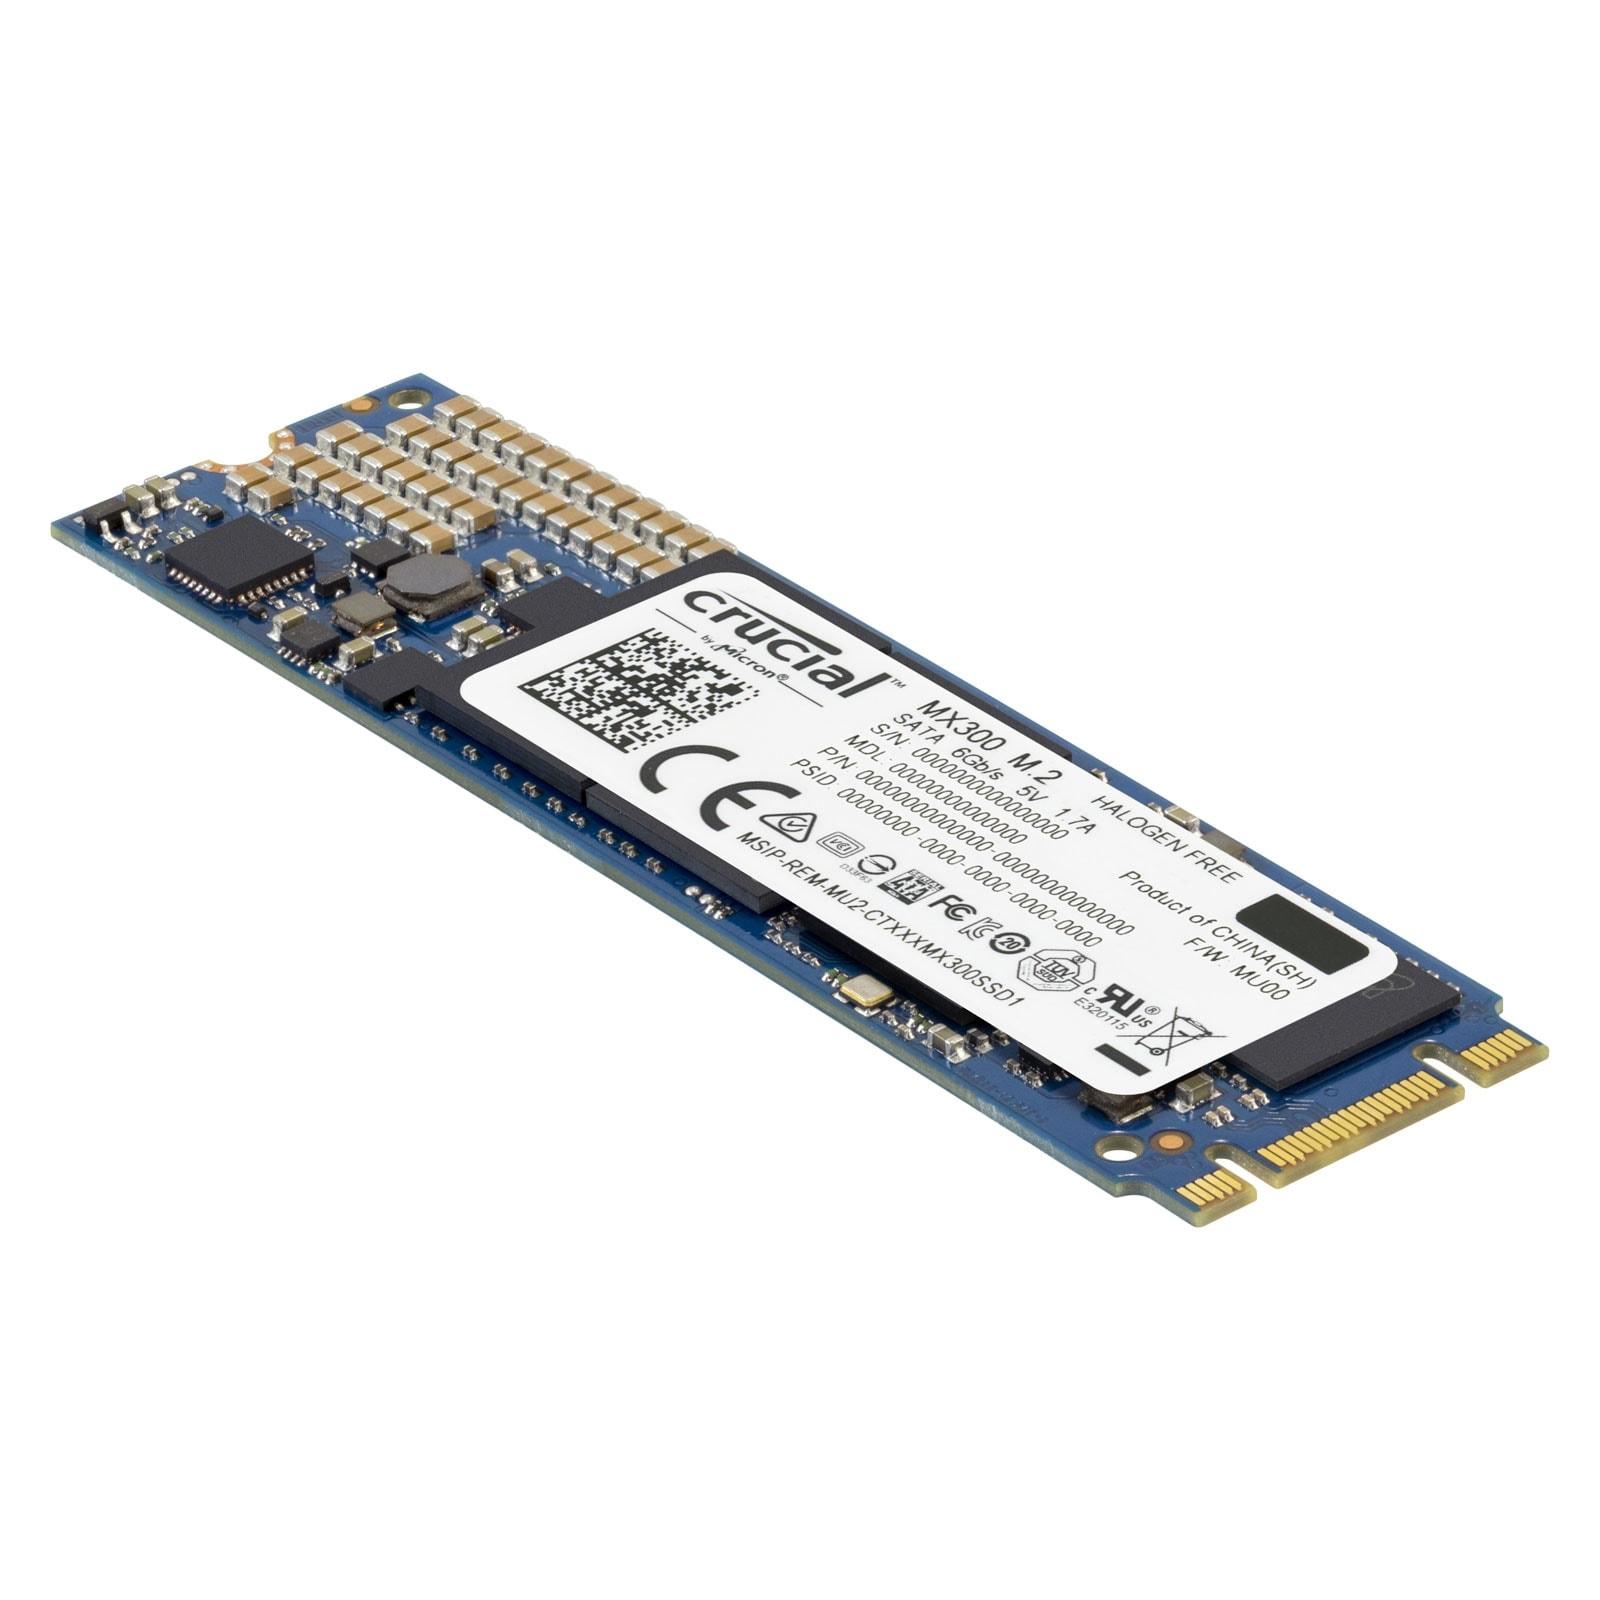 Crucial MX300 480-525Go - Disque SSD Crucial - Cybertek.fr - 0